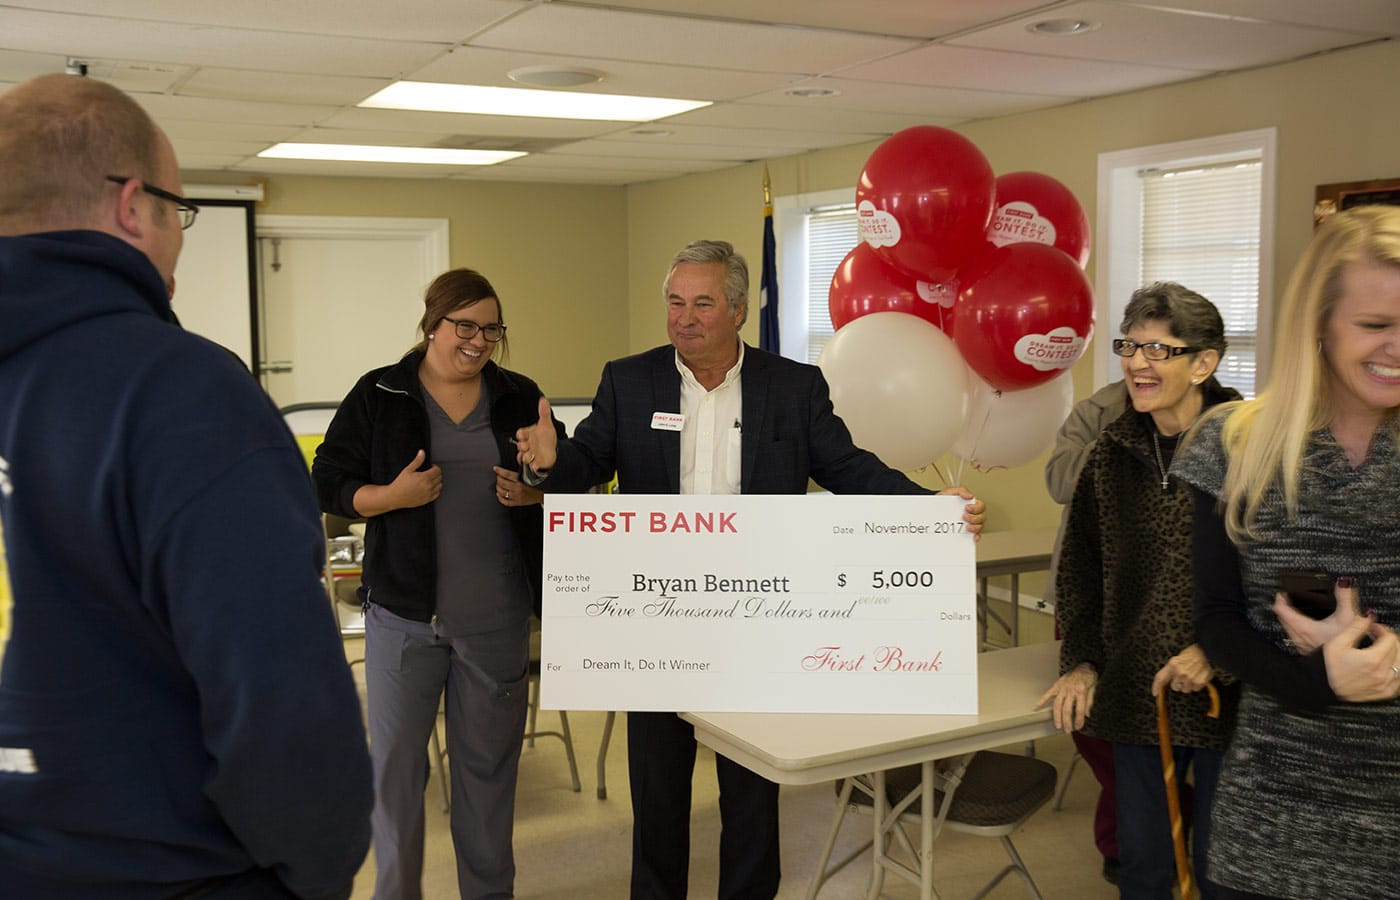 John Long, First Bank regional executive, congratulates Bryan during the surprise.